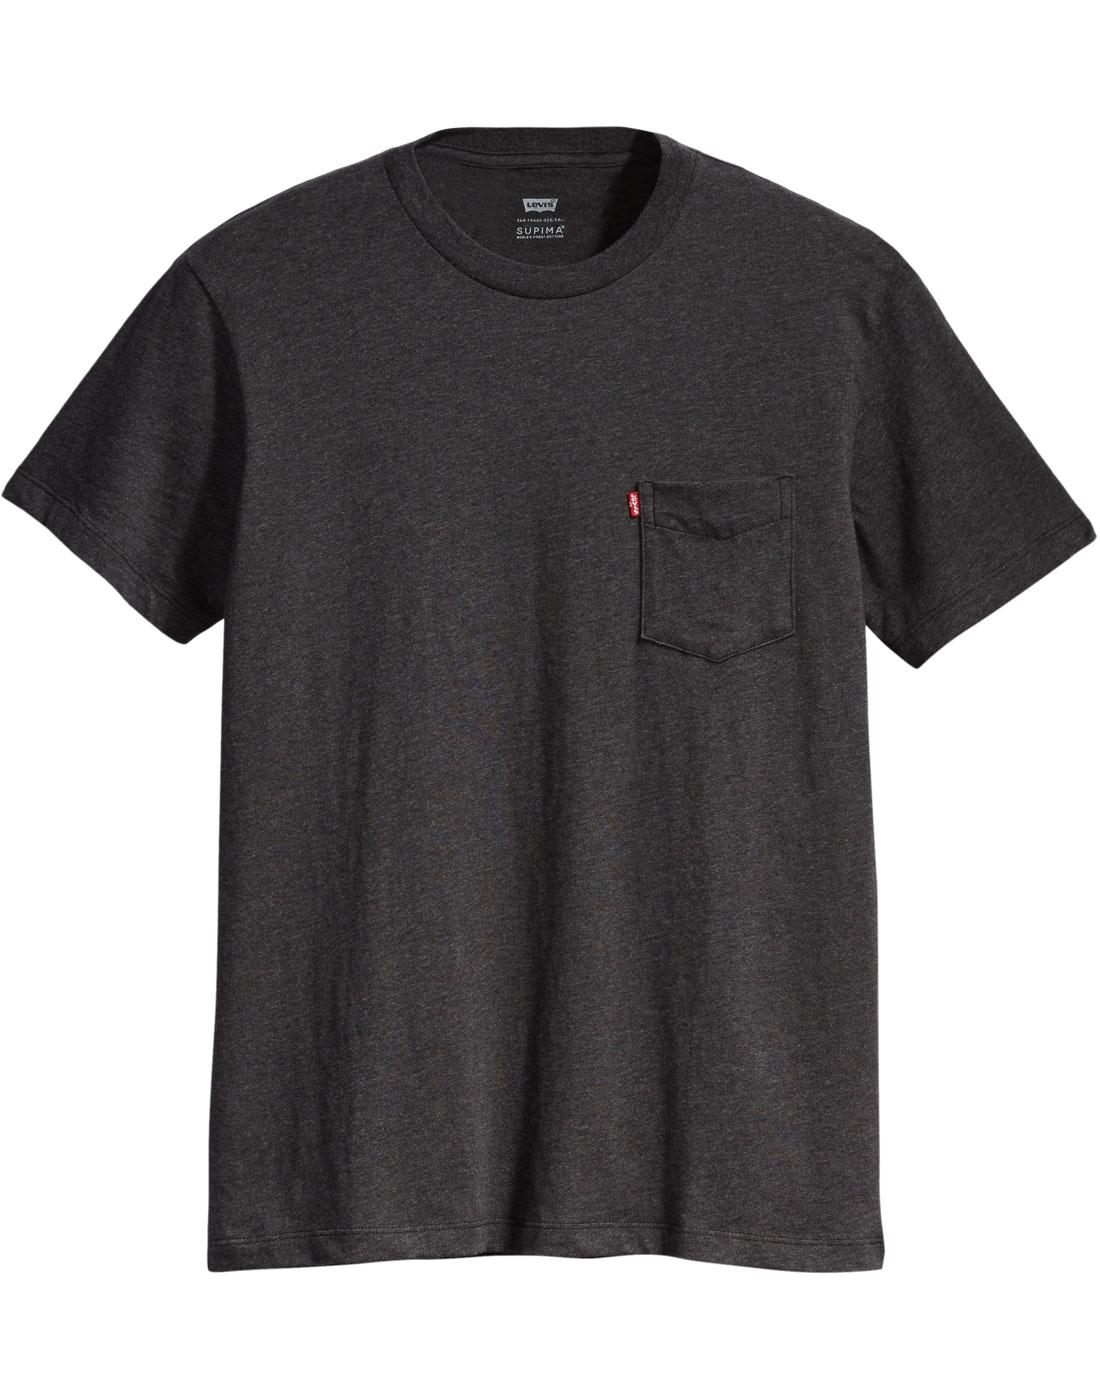 LEVI'S Sunset Pocket Retro 70s T-shirt (OBSIDIAN)